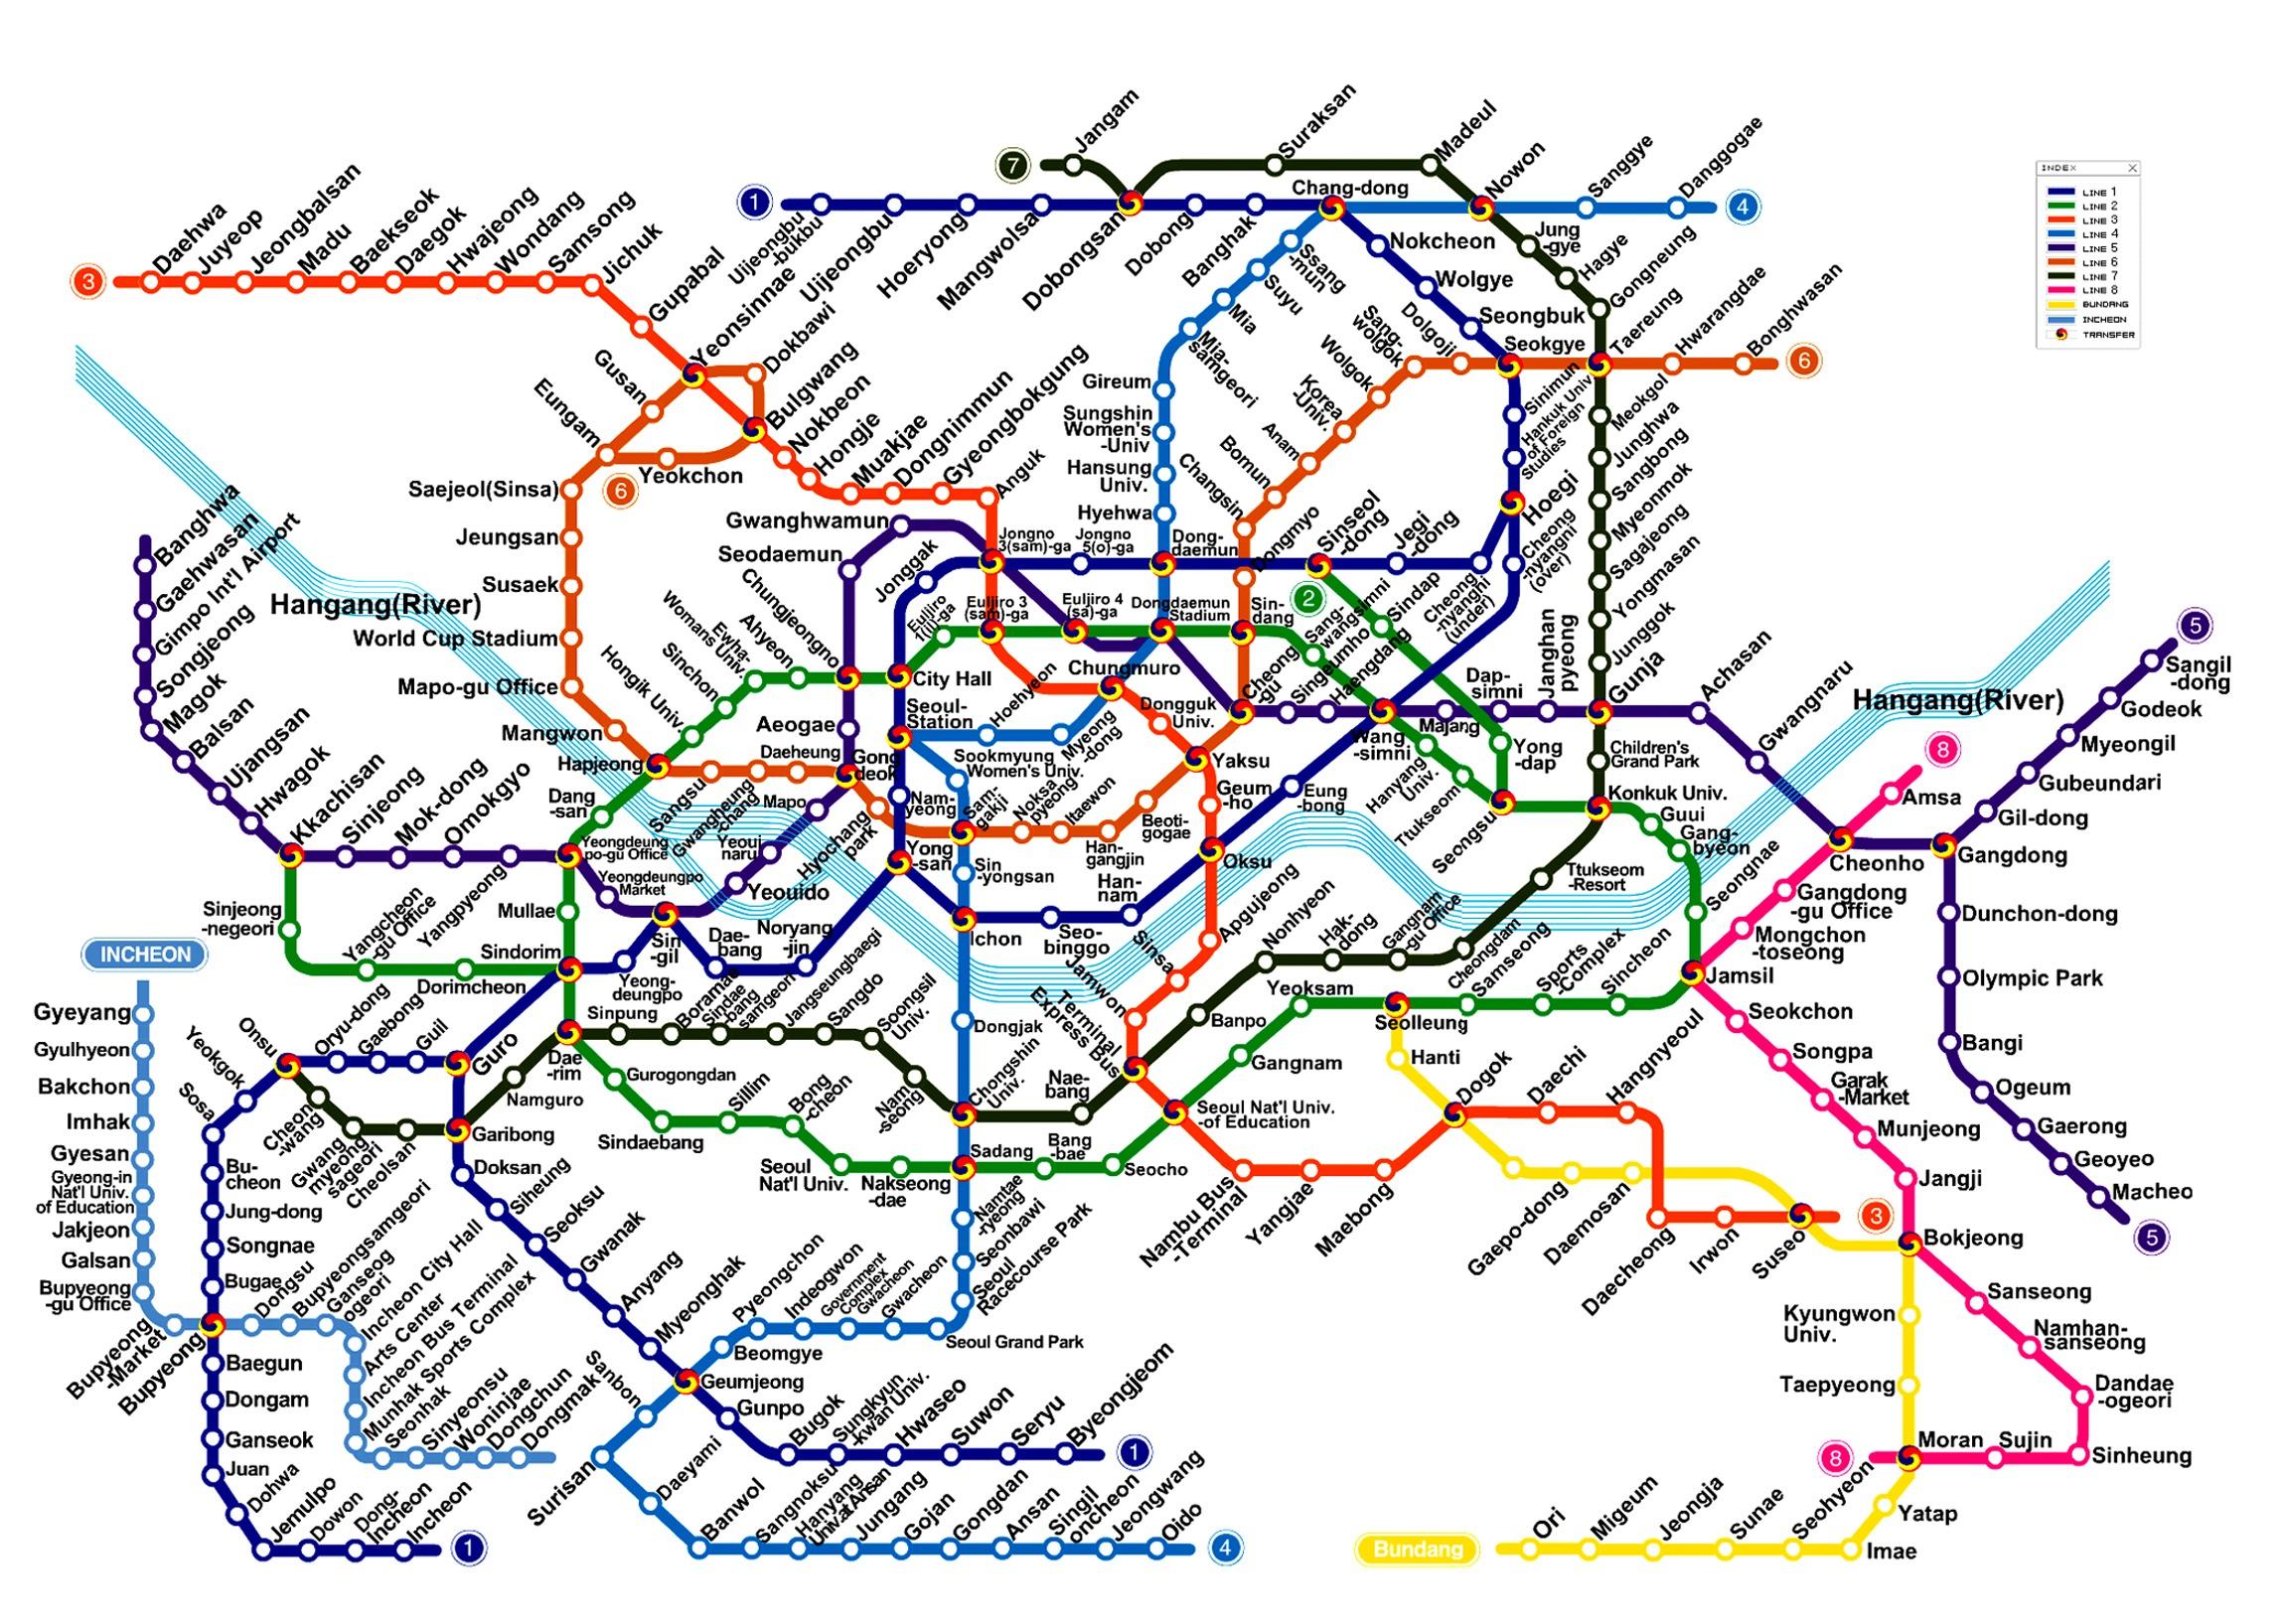 Seoul Subway Map Seoul Subway Map | The Soul of Seoul Seoul Subway Map